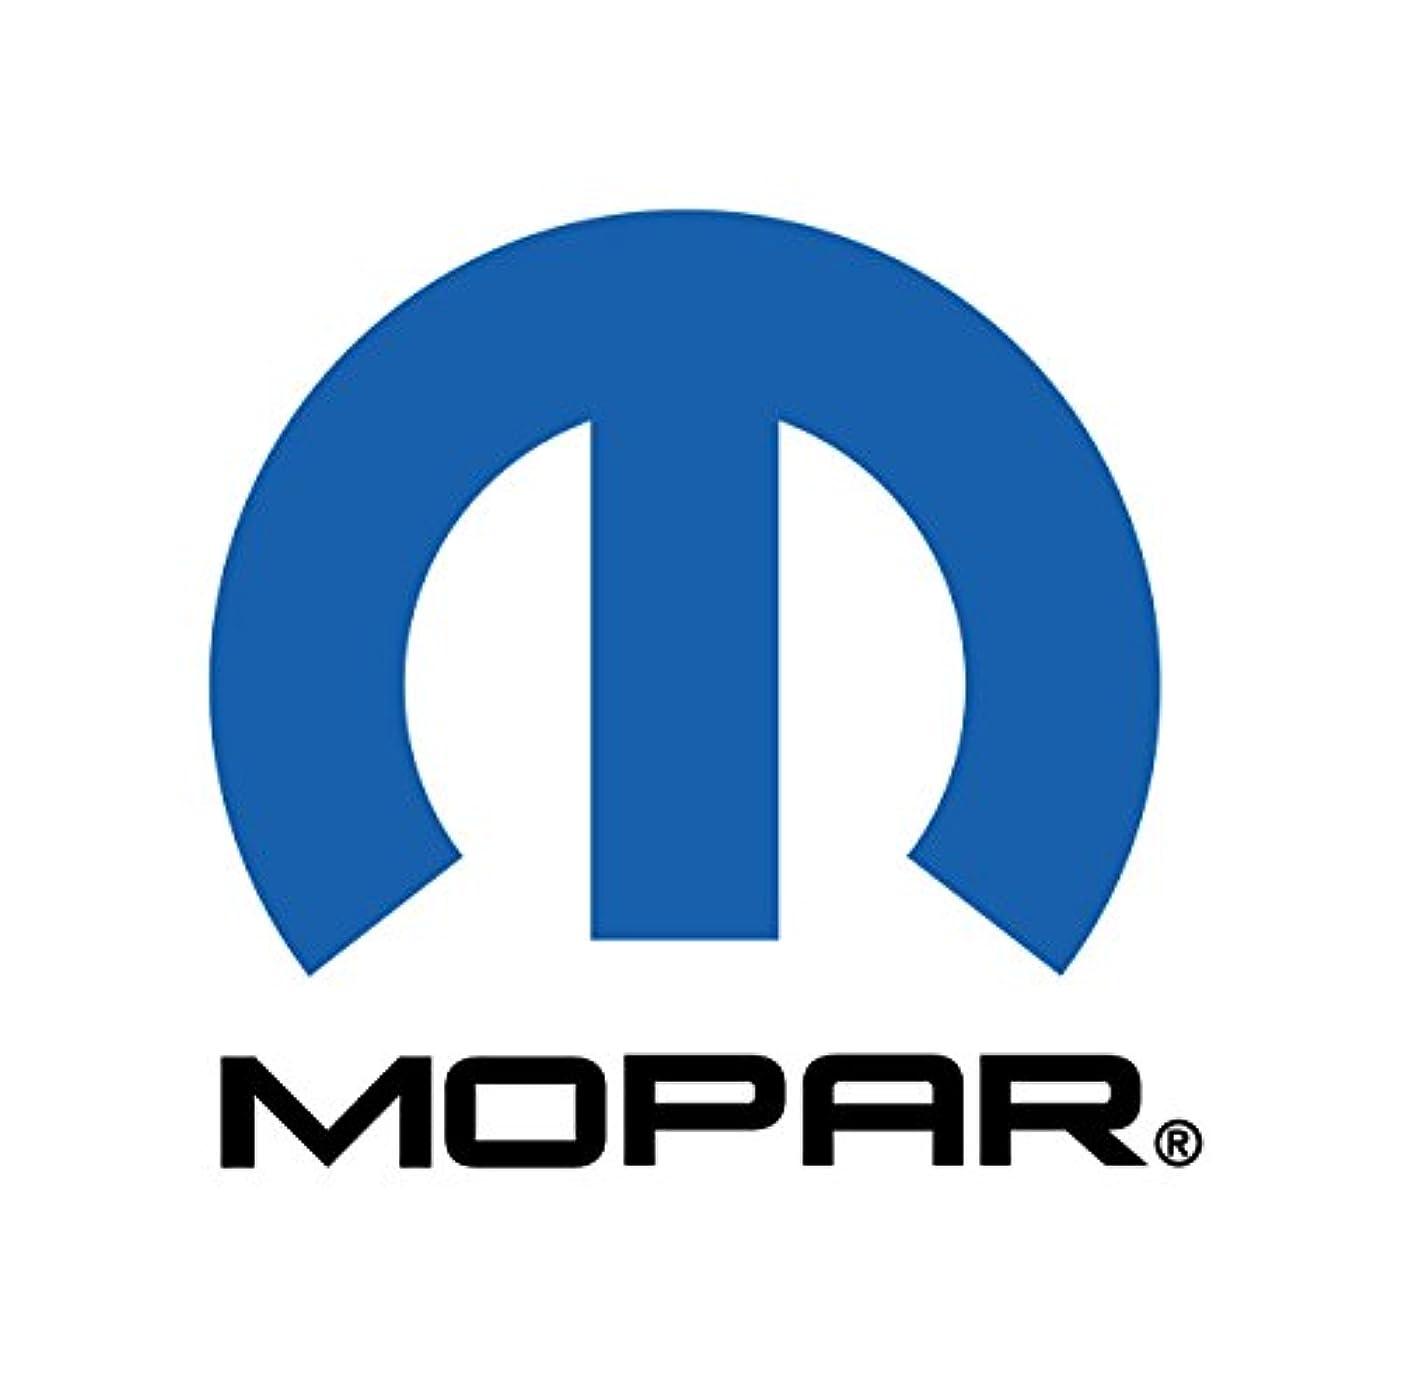 二次仕様少ないMopar Bracket Headlamp Mou by Mopar